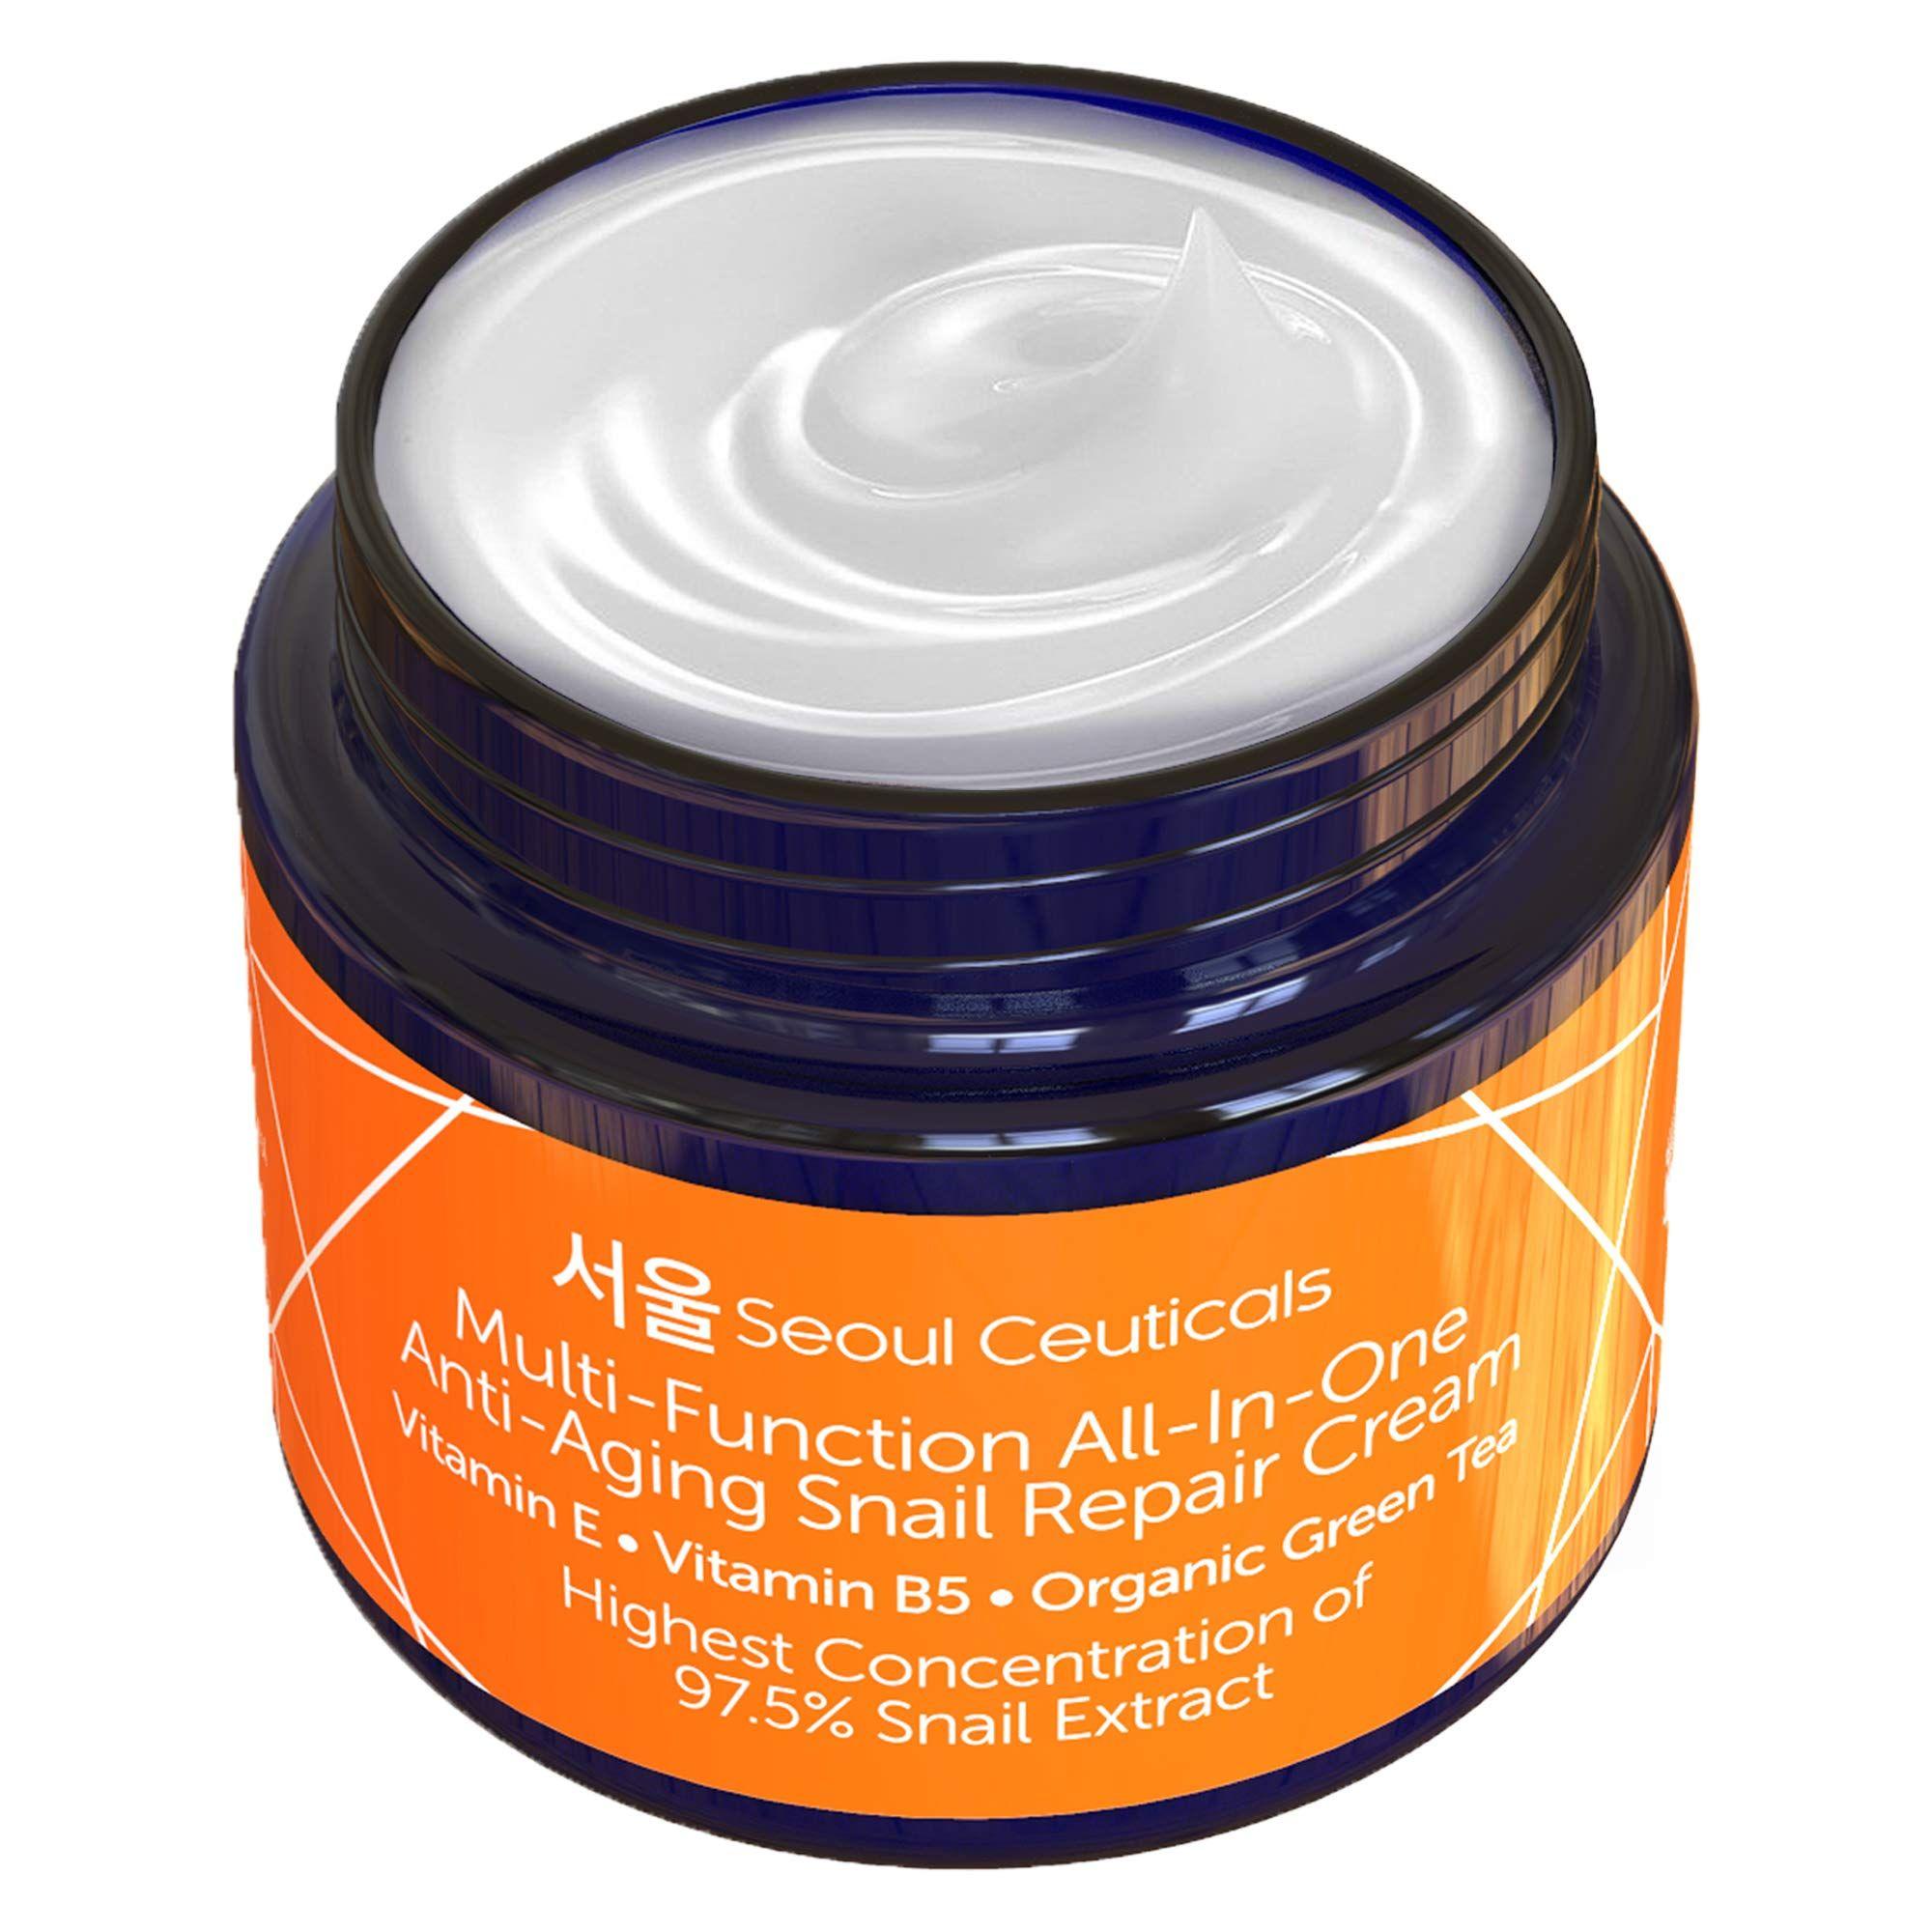 Korean Snail Repair Cream Moisturizer In 2020 Korean Skincare Best Korean Moisturizer Korean Beauty Routine